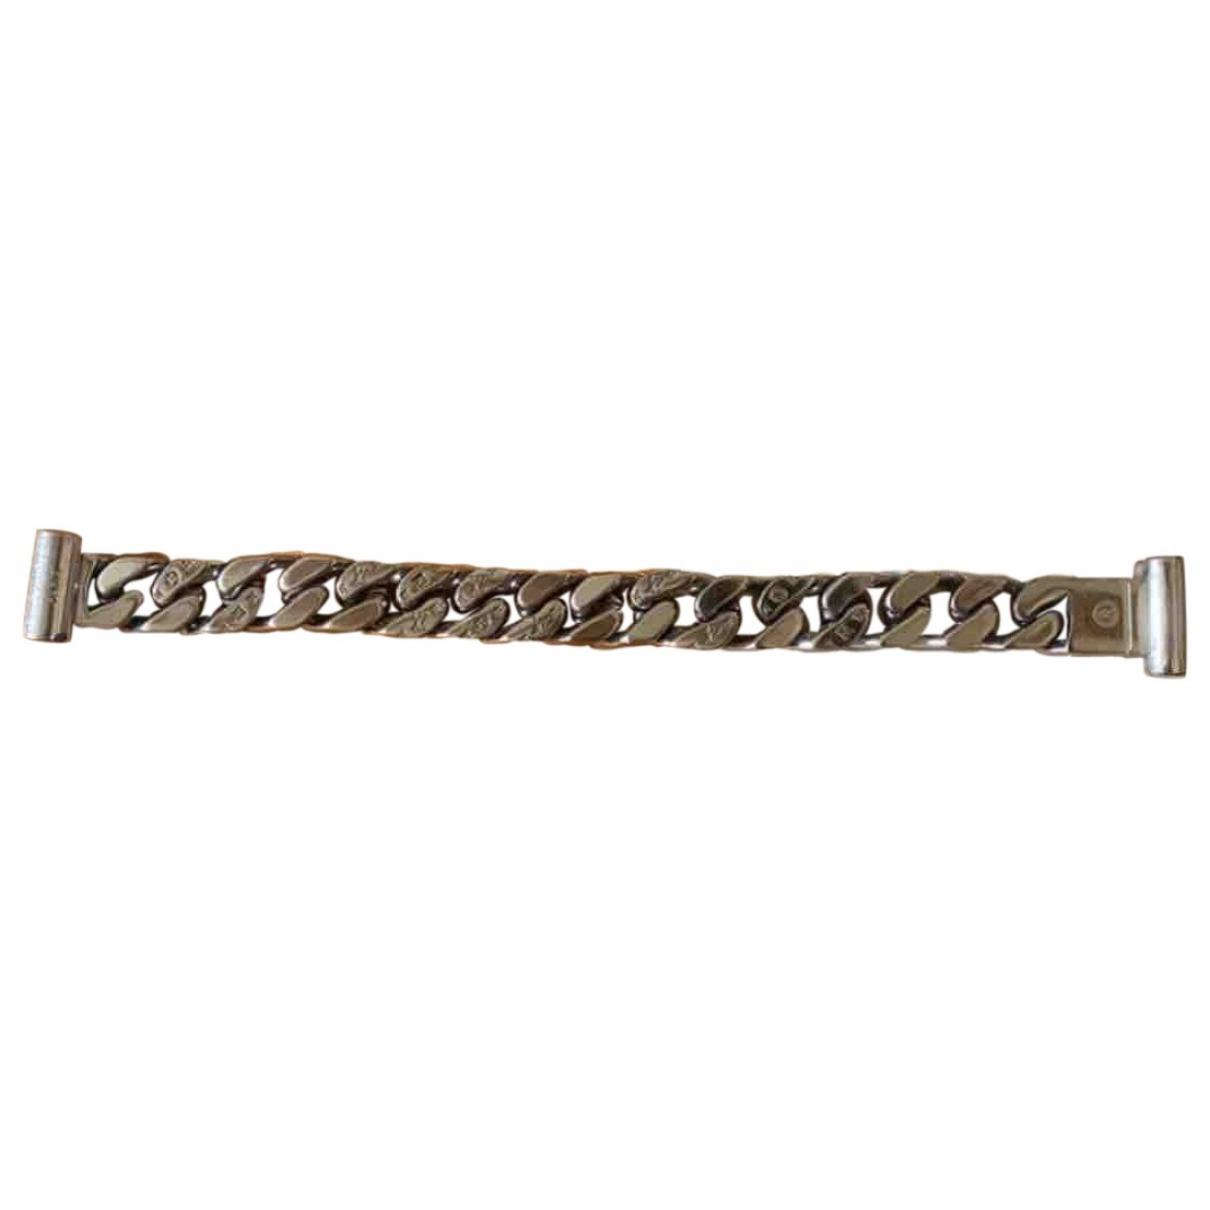 Louis Vuitton Monogram Schmuckstuecke in  Silber Metall